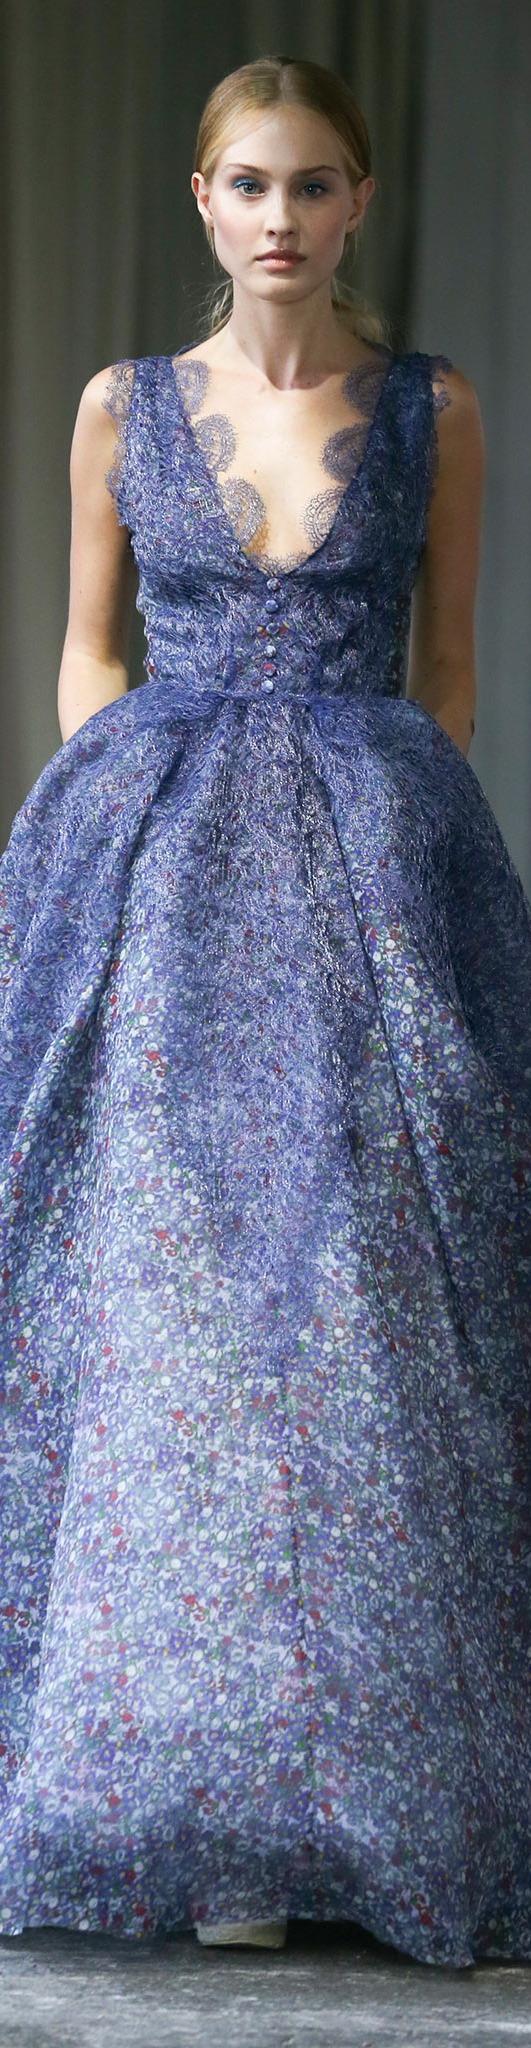 Navy blue wedding wedding dress luisa beccaria spring